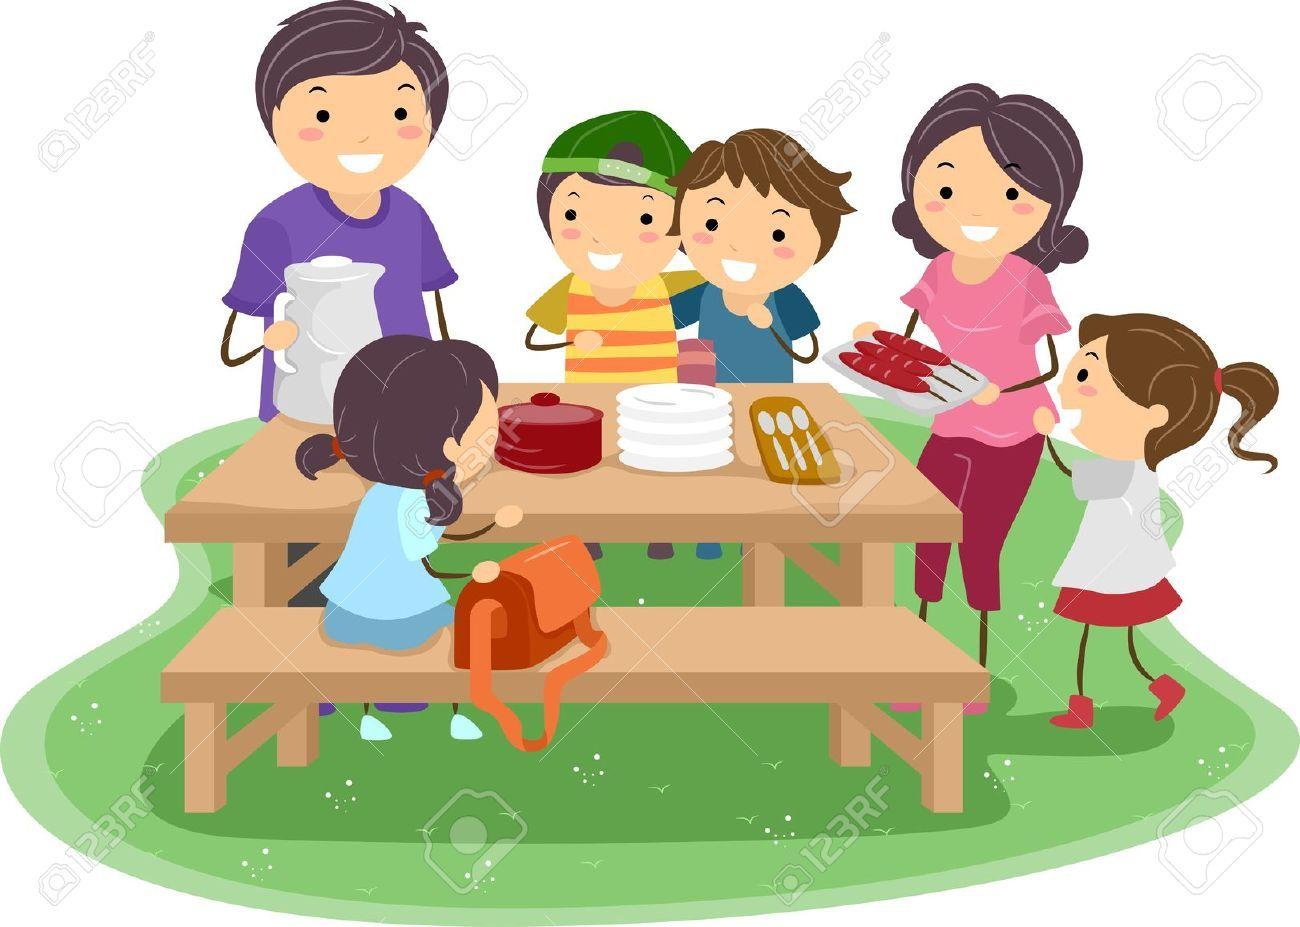 Kids picnic clipart 3 » Clipart Portal.